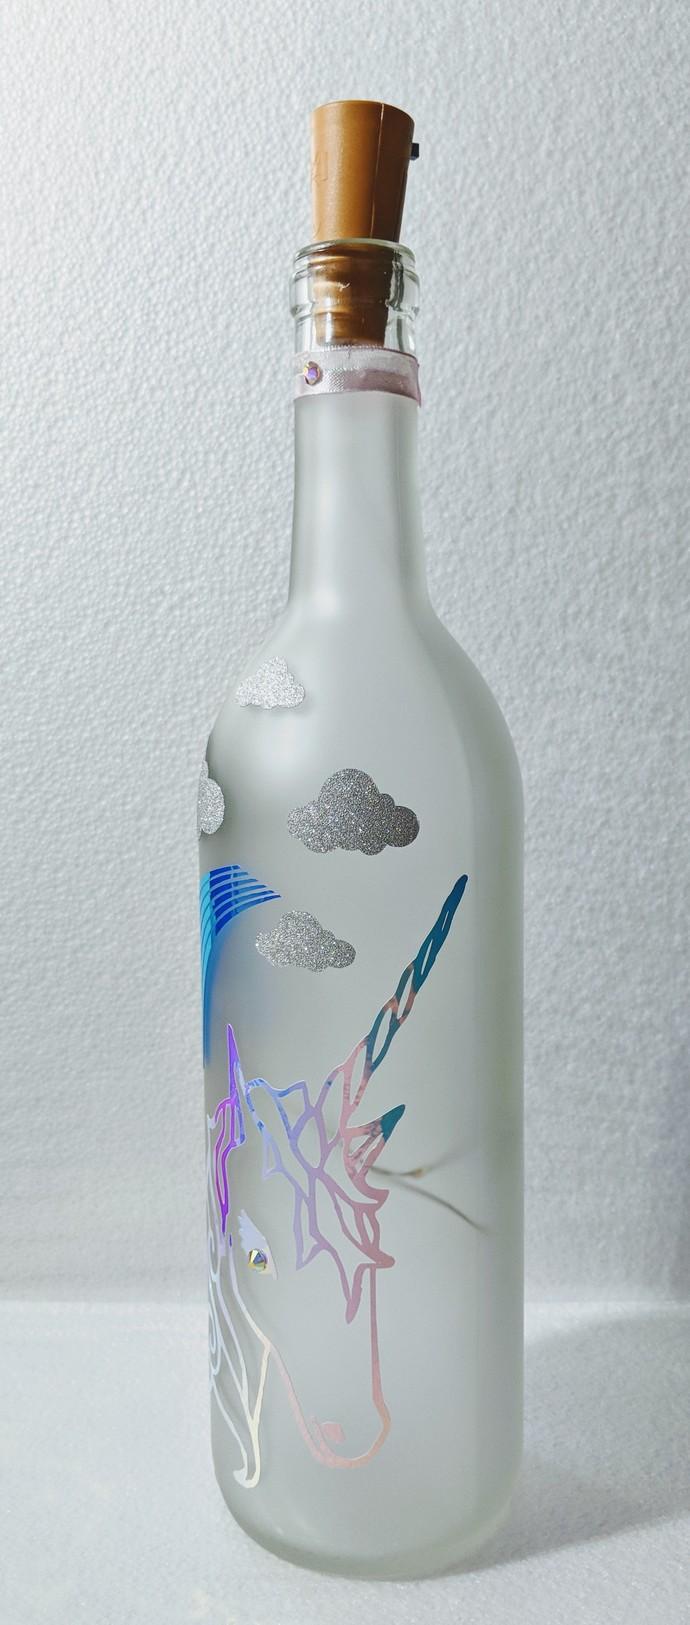 Kori the Unicorn light bottle.